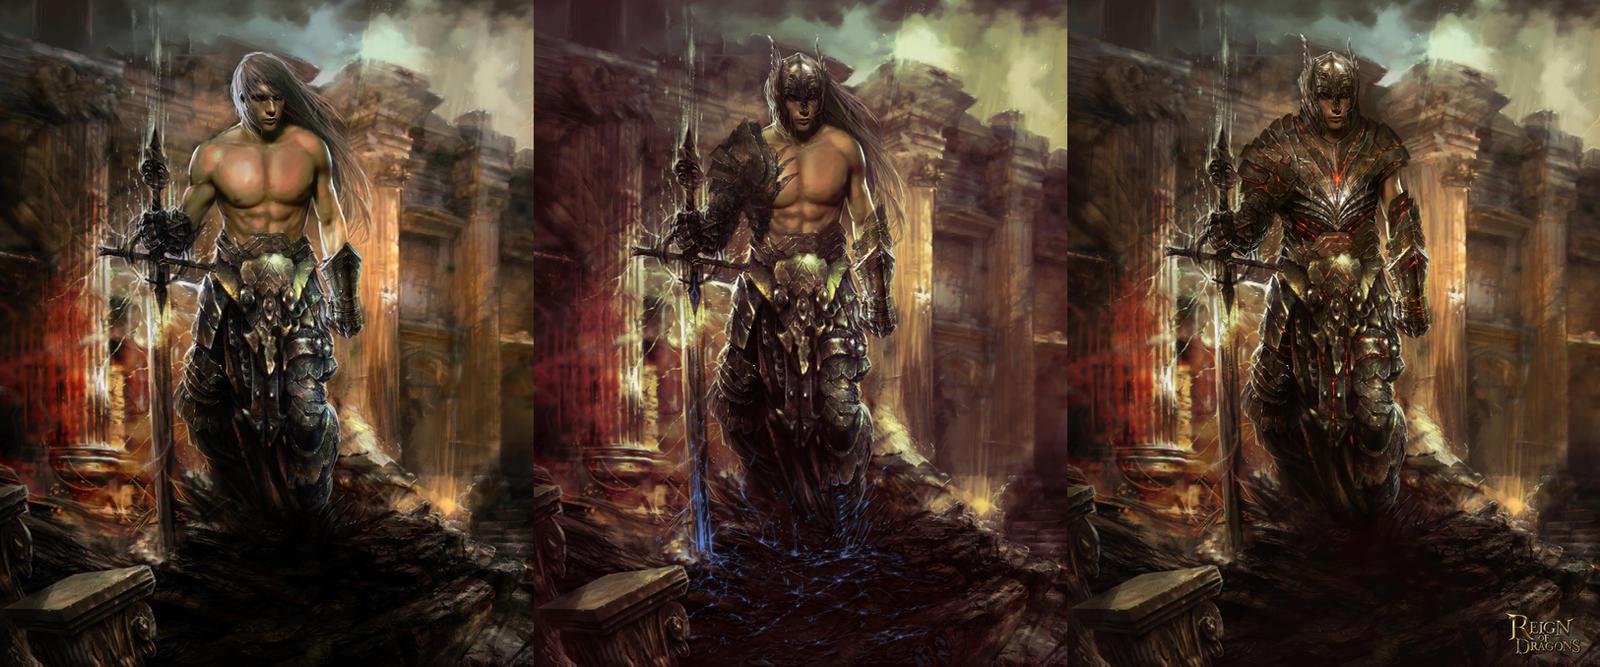 Beigas the sword - Normal by PabloFernandezArtwrk